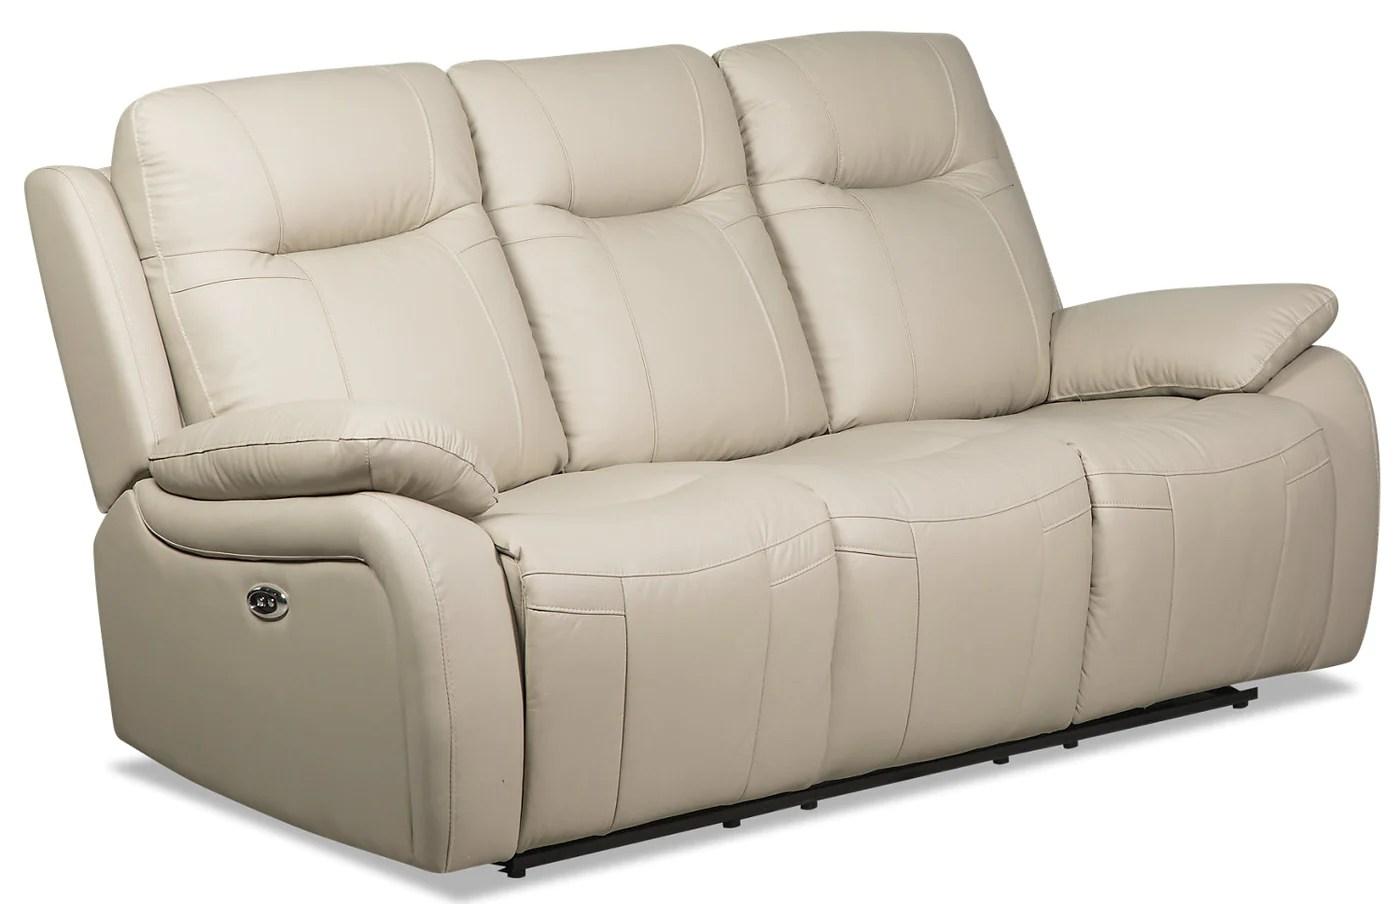 Kora Genuine Leather Power Reclining Sofa Beige